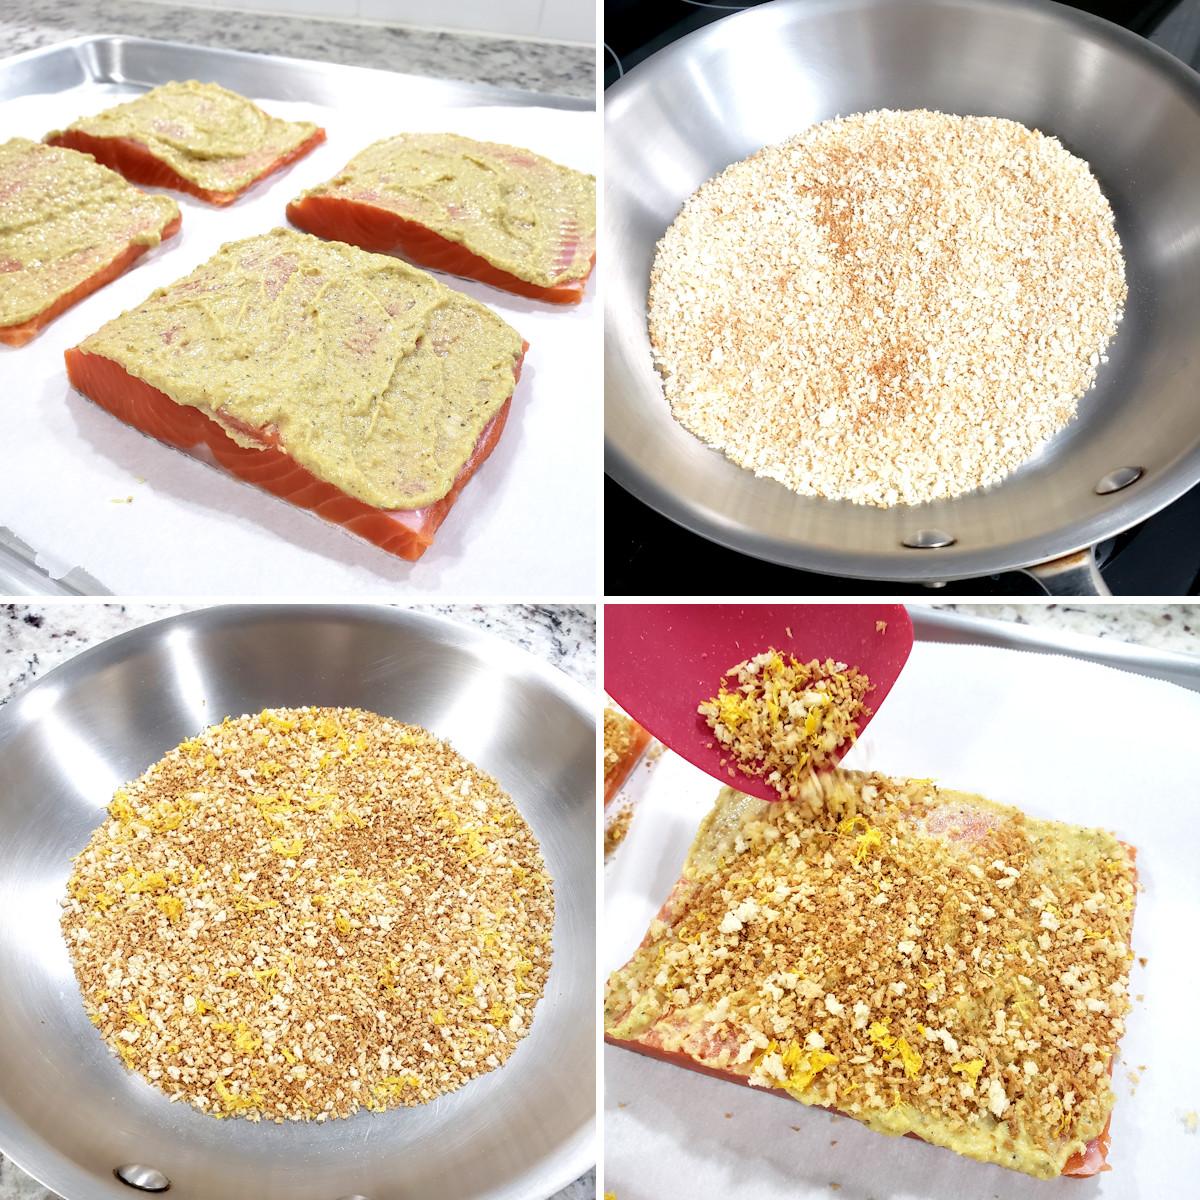 Preparing panko crusted salmon.